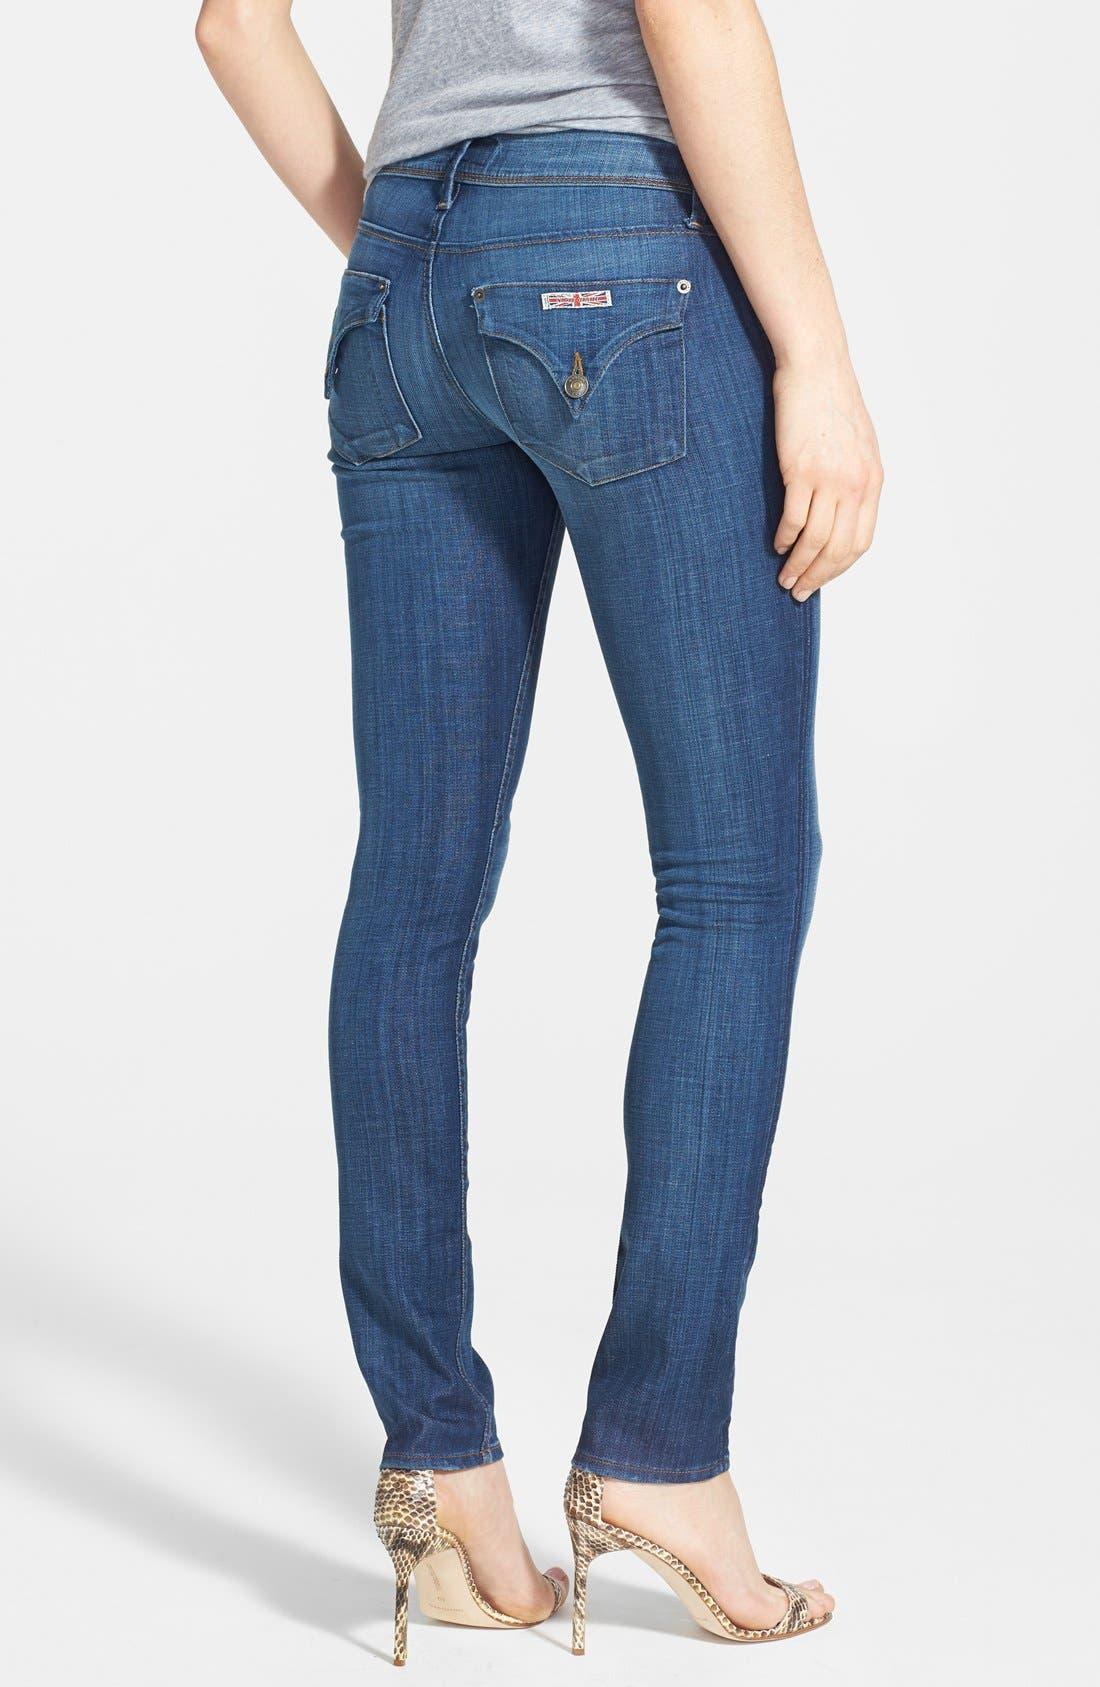 Alternate Image 2  - Hudson Jeans 'Collin' Skinny Jeans (Saville)